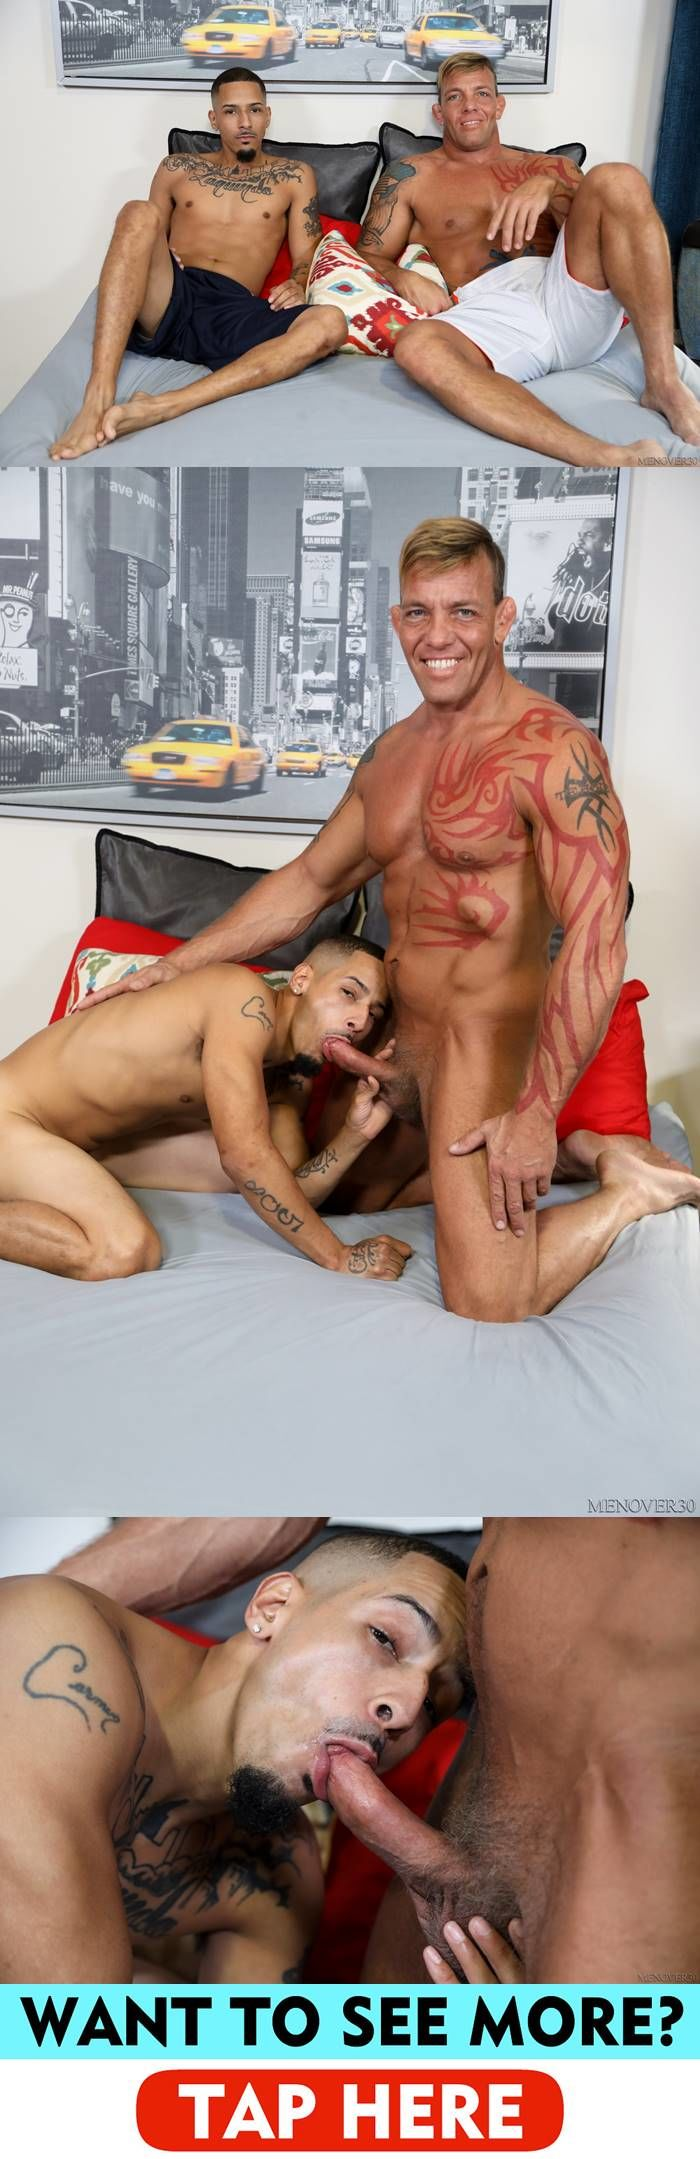 Men Over 30: Juan Carlos & Tristan Brazer